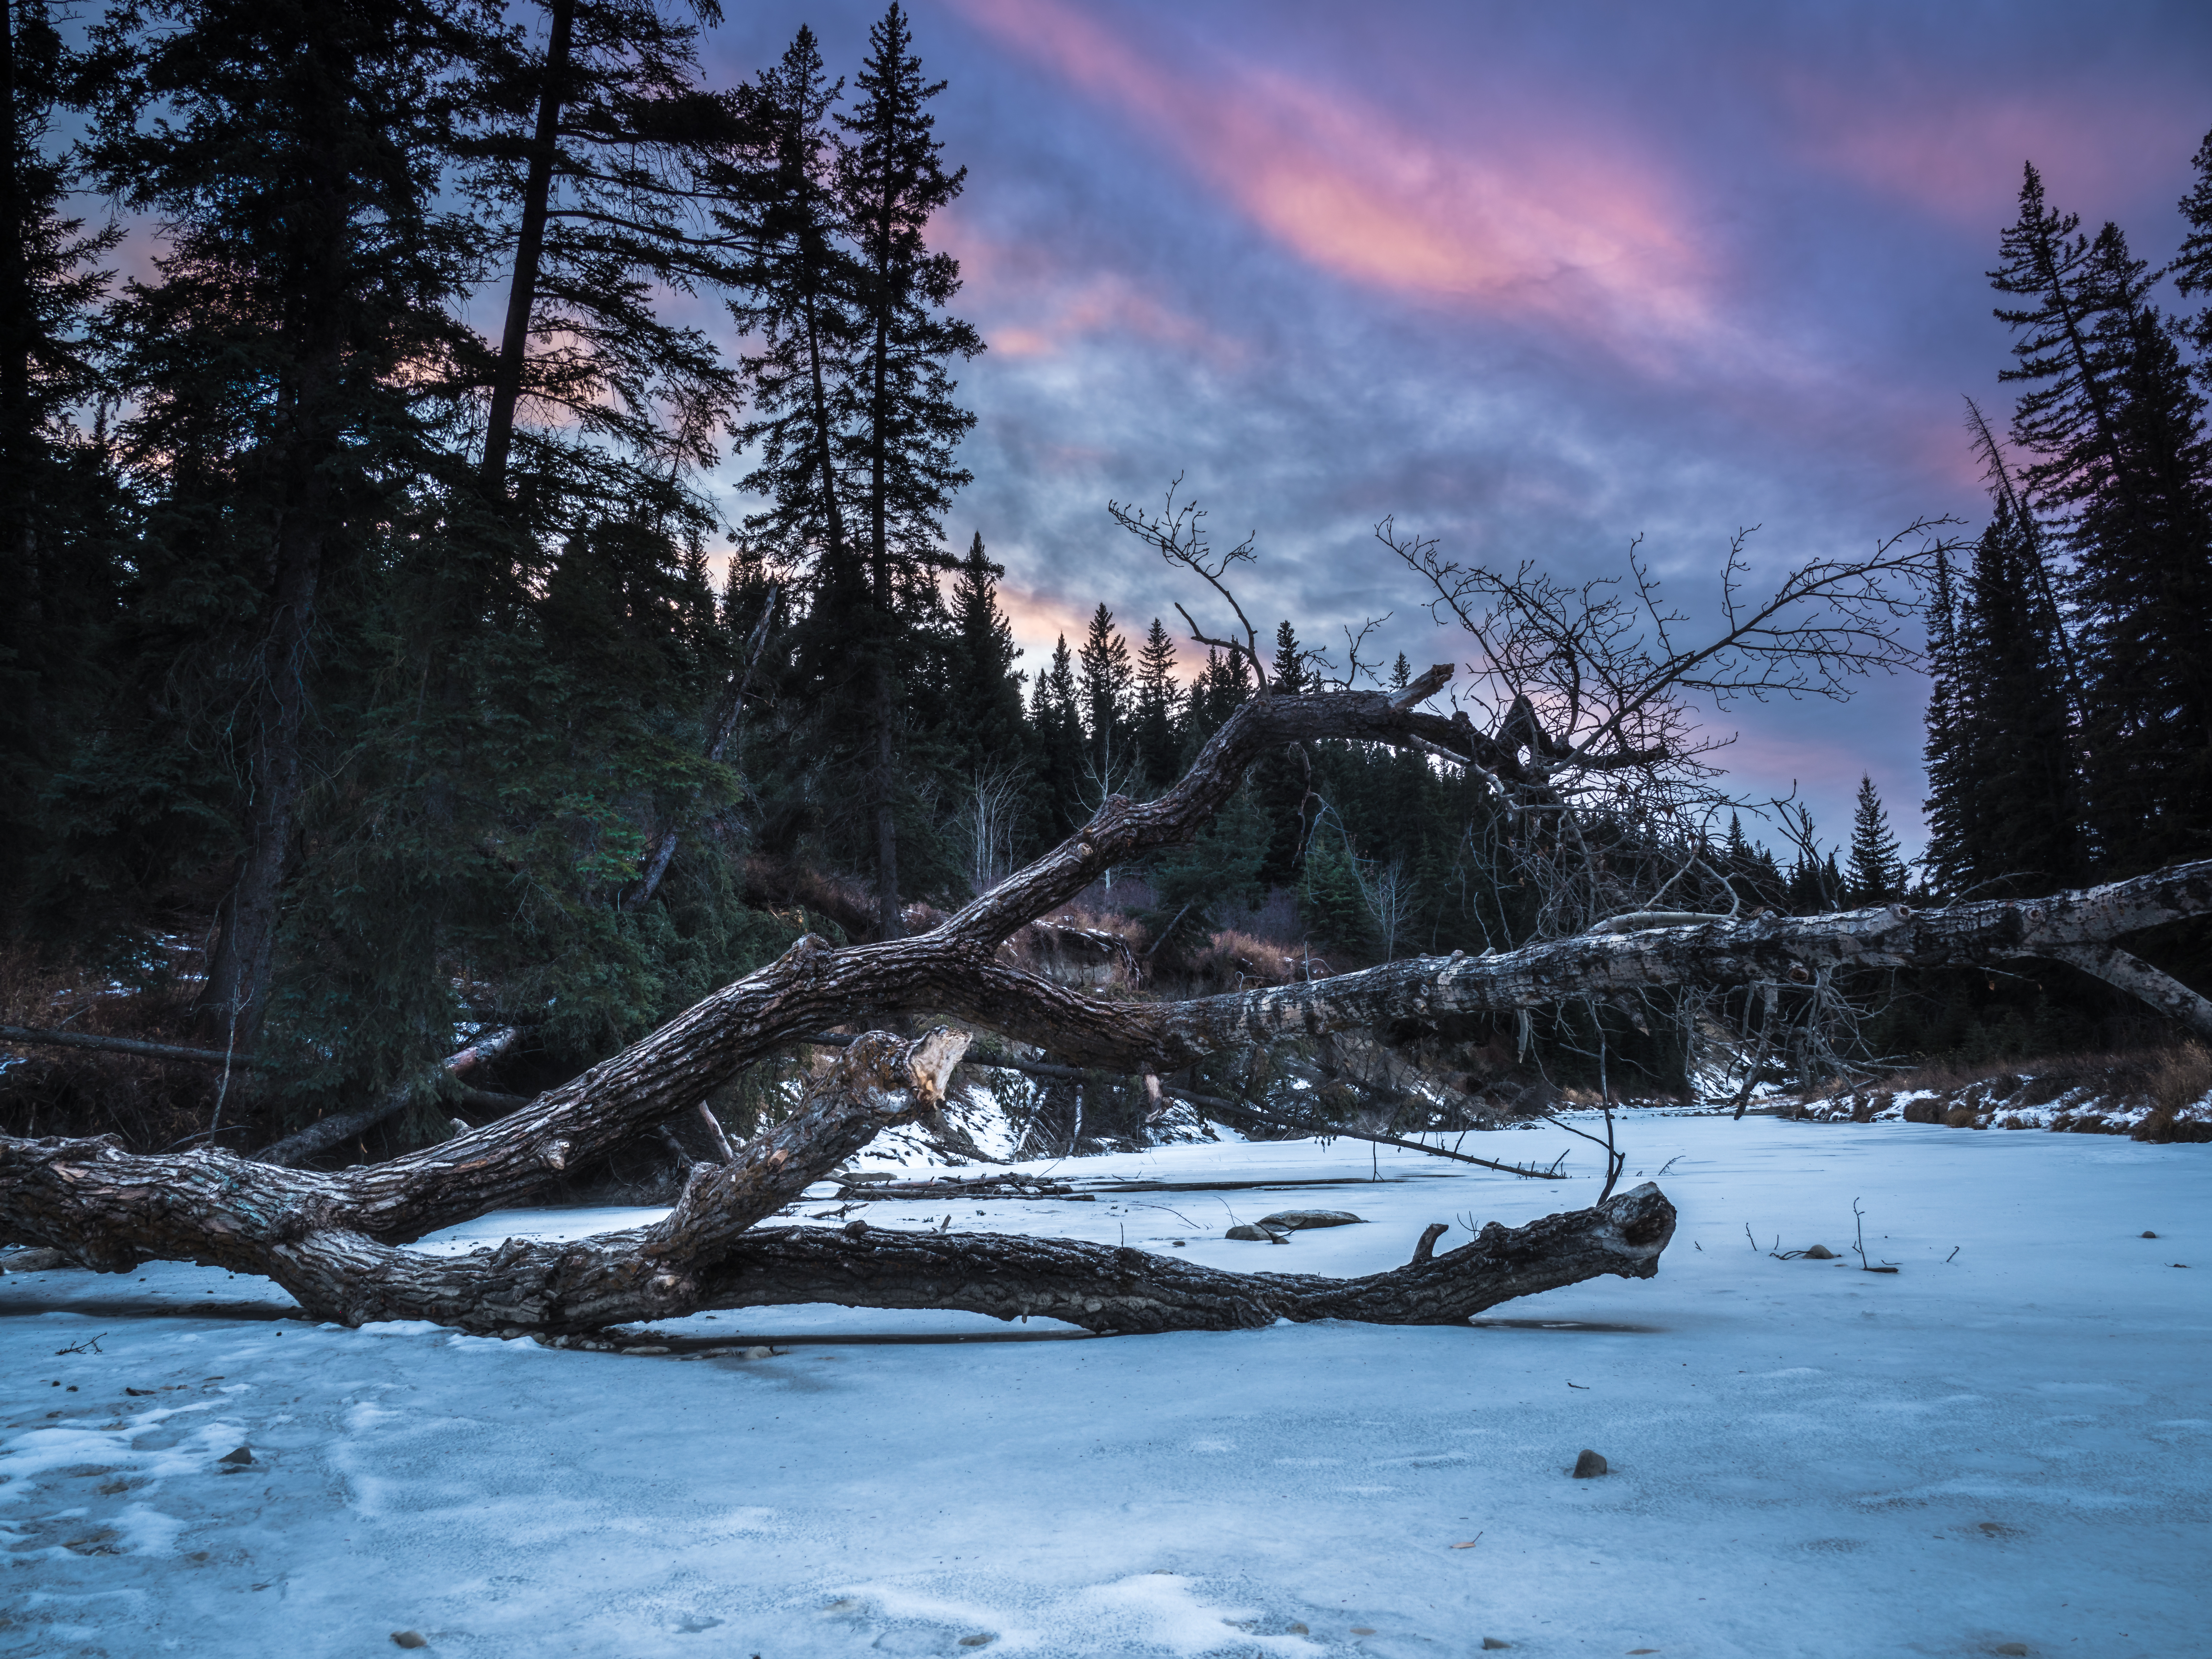 The remnants of a fallen tree lay over Fish Creek, Alberta, Canada